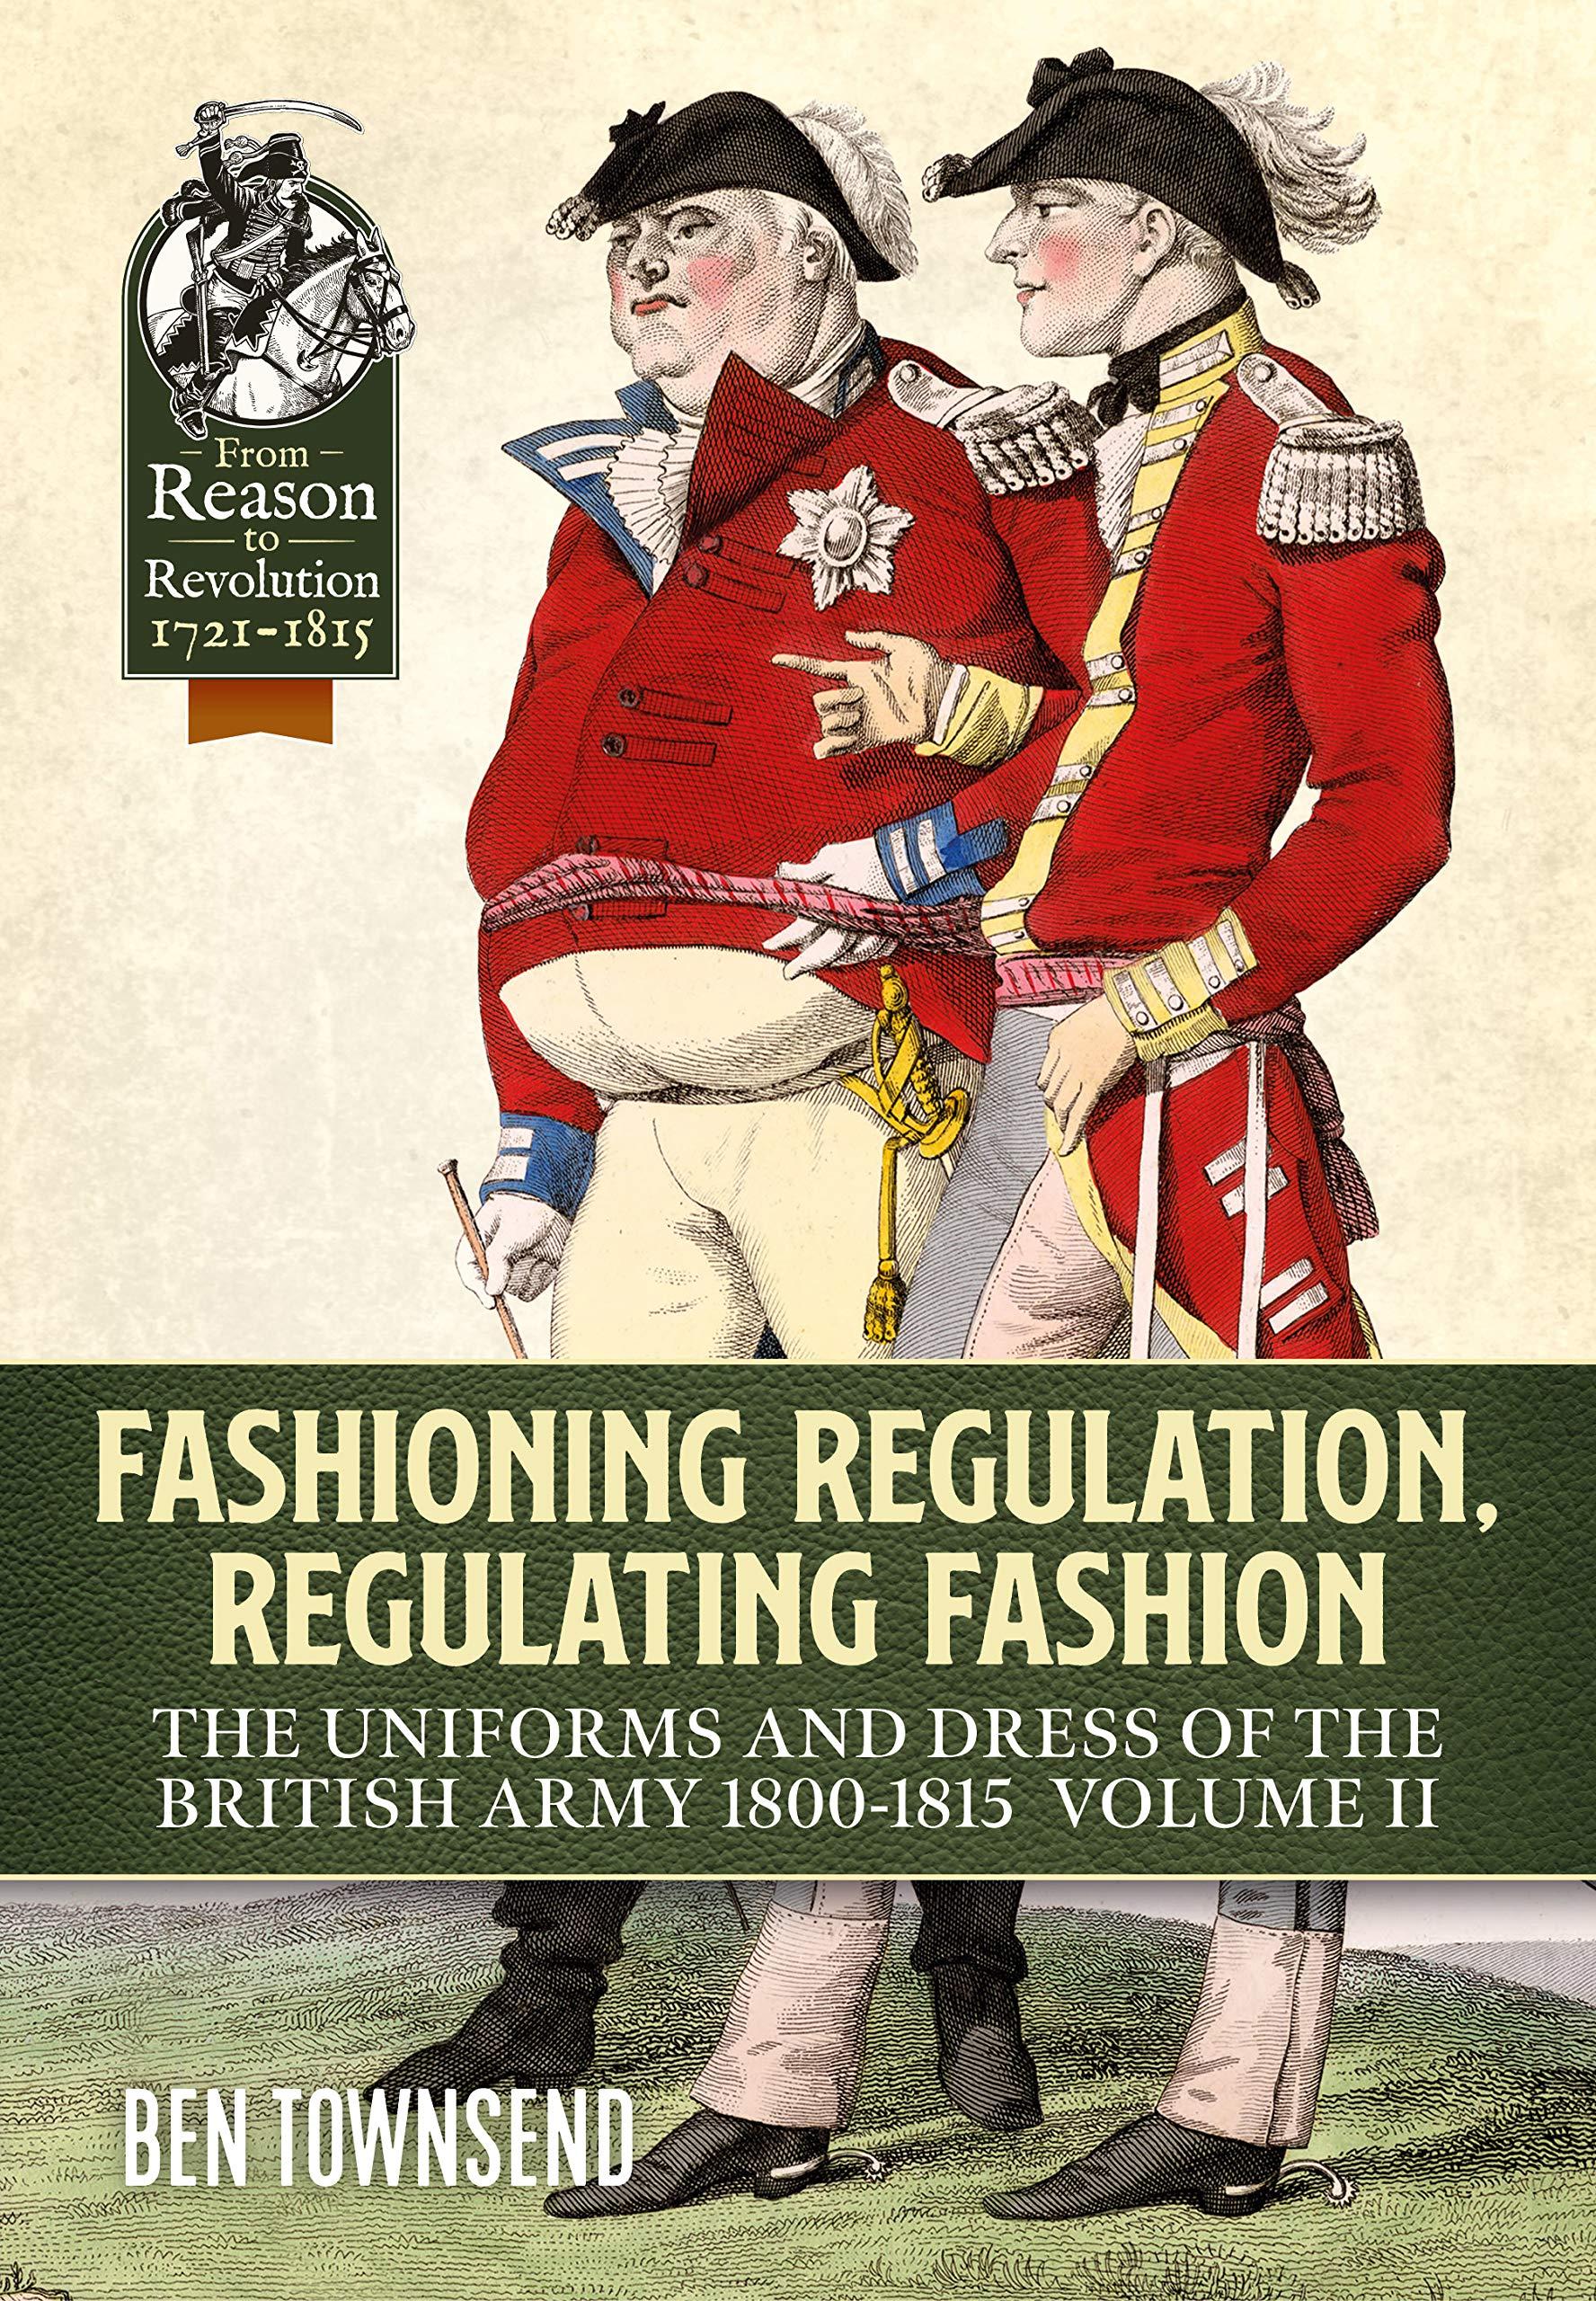 Fashioning Regulation, Regulating Fashion: The Uniforms and Dress of